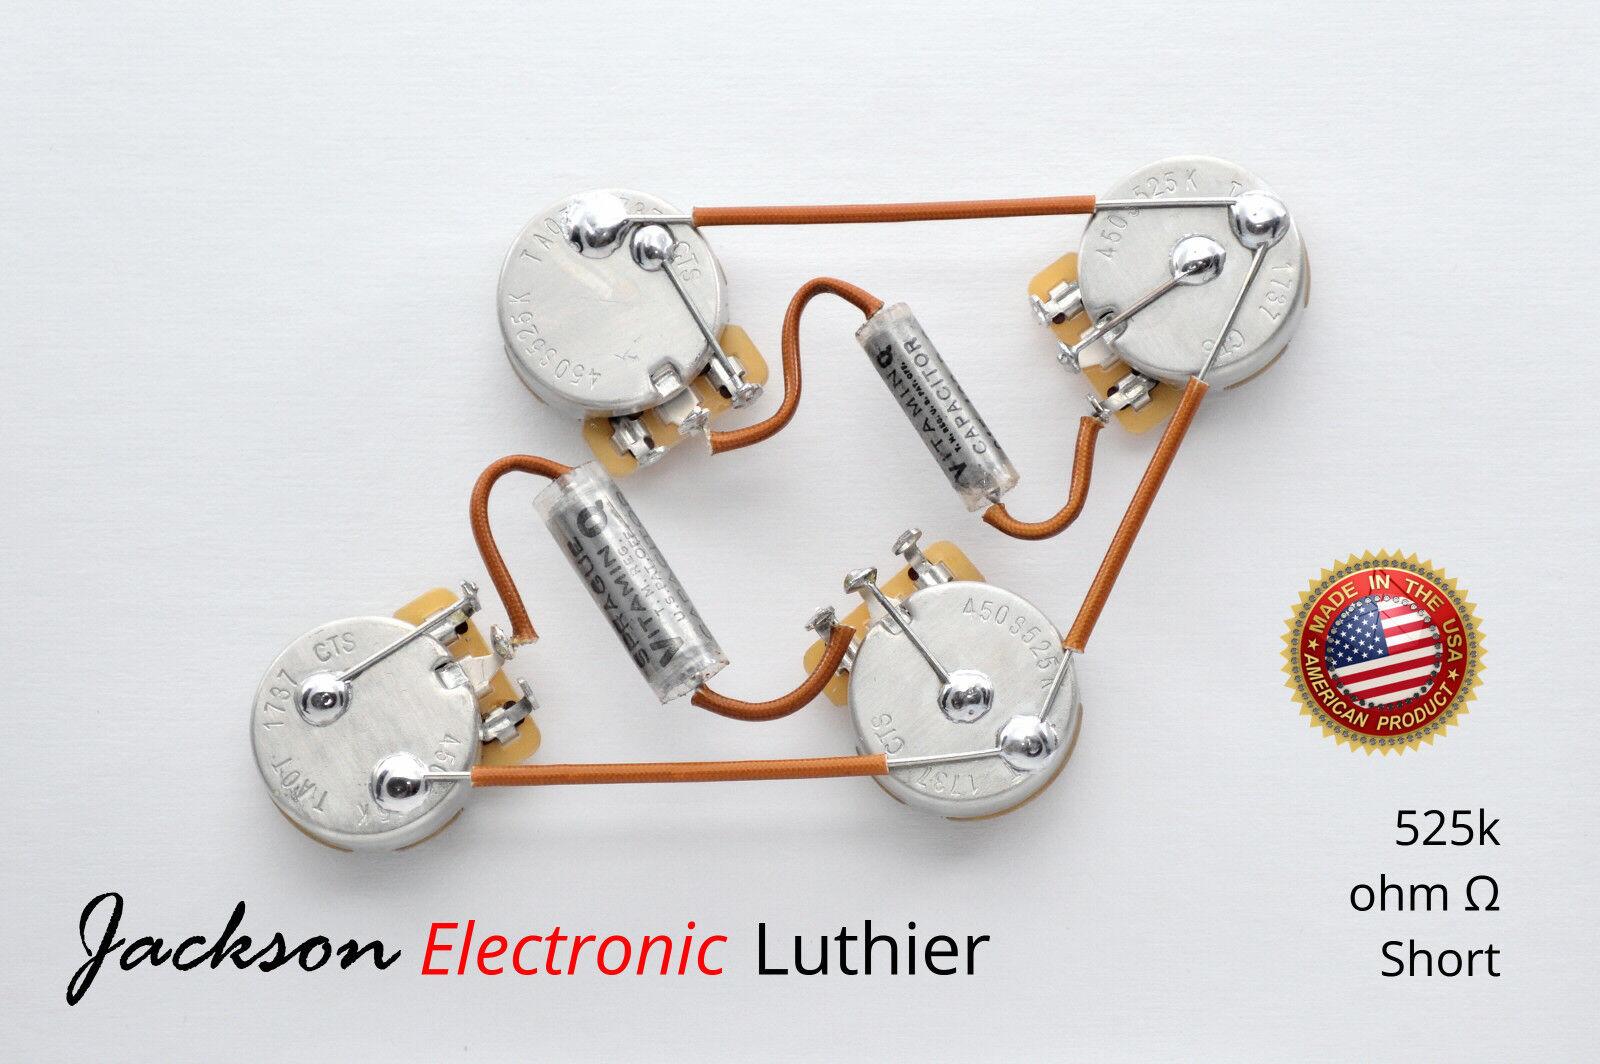 Les Les Les Paul Wiring Harness Spraque Vitamin Q PIO .0.015 uF N/.022 uF Brg CTS 525k 393142